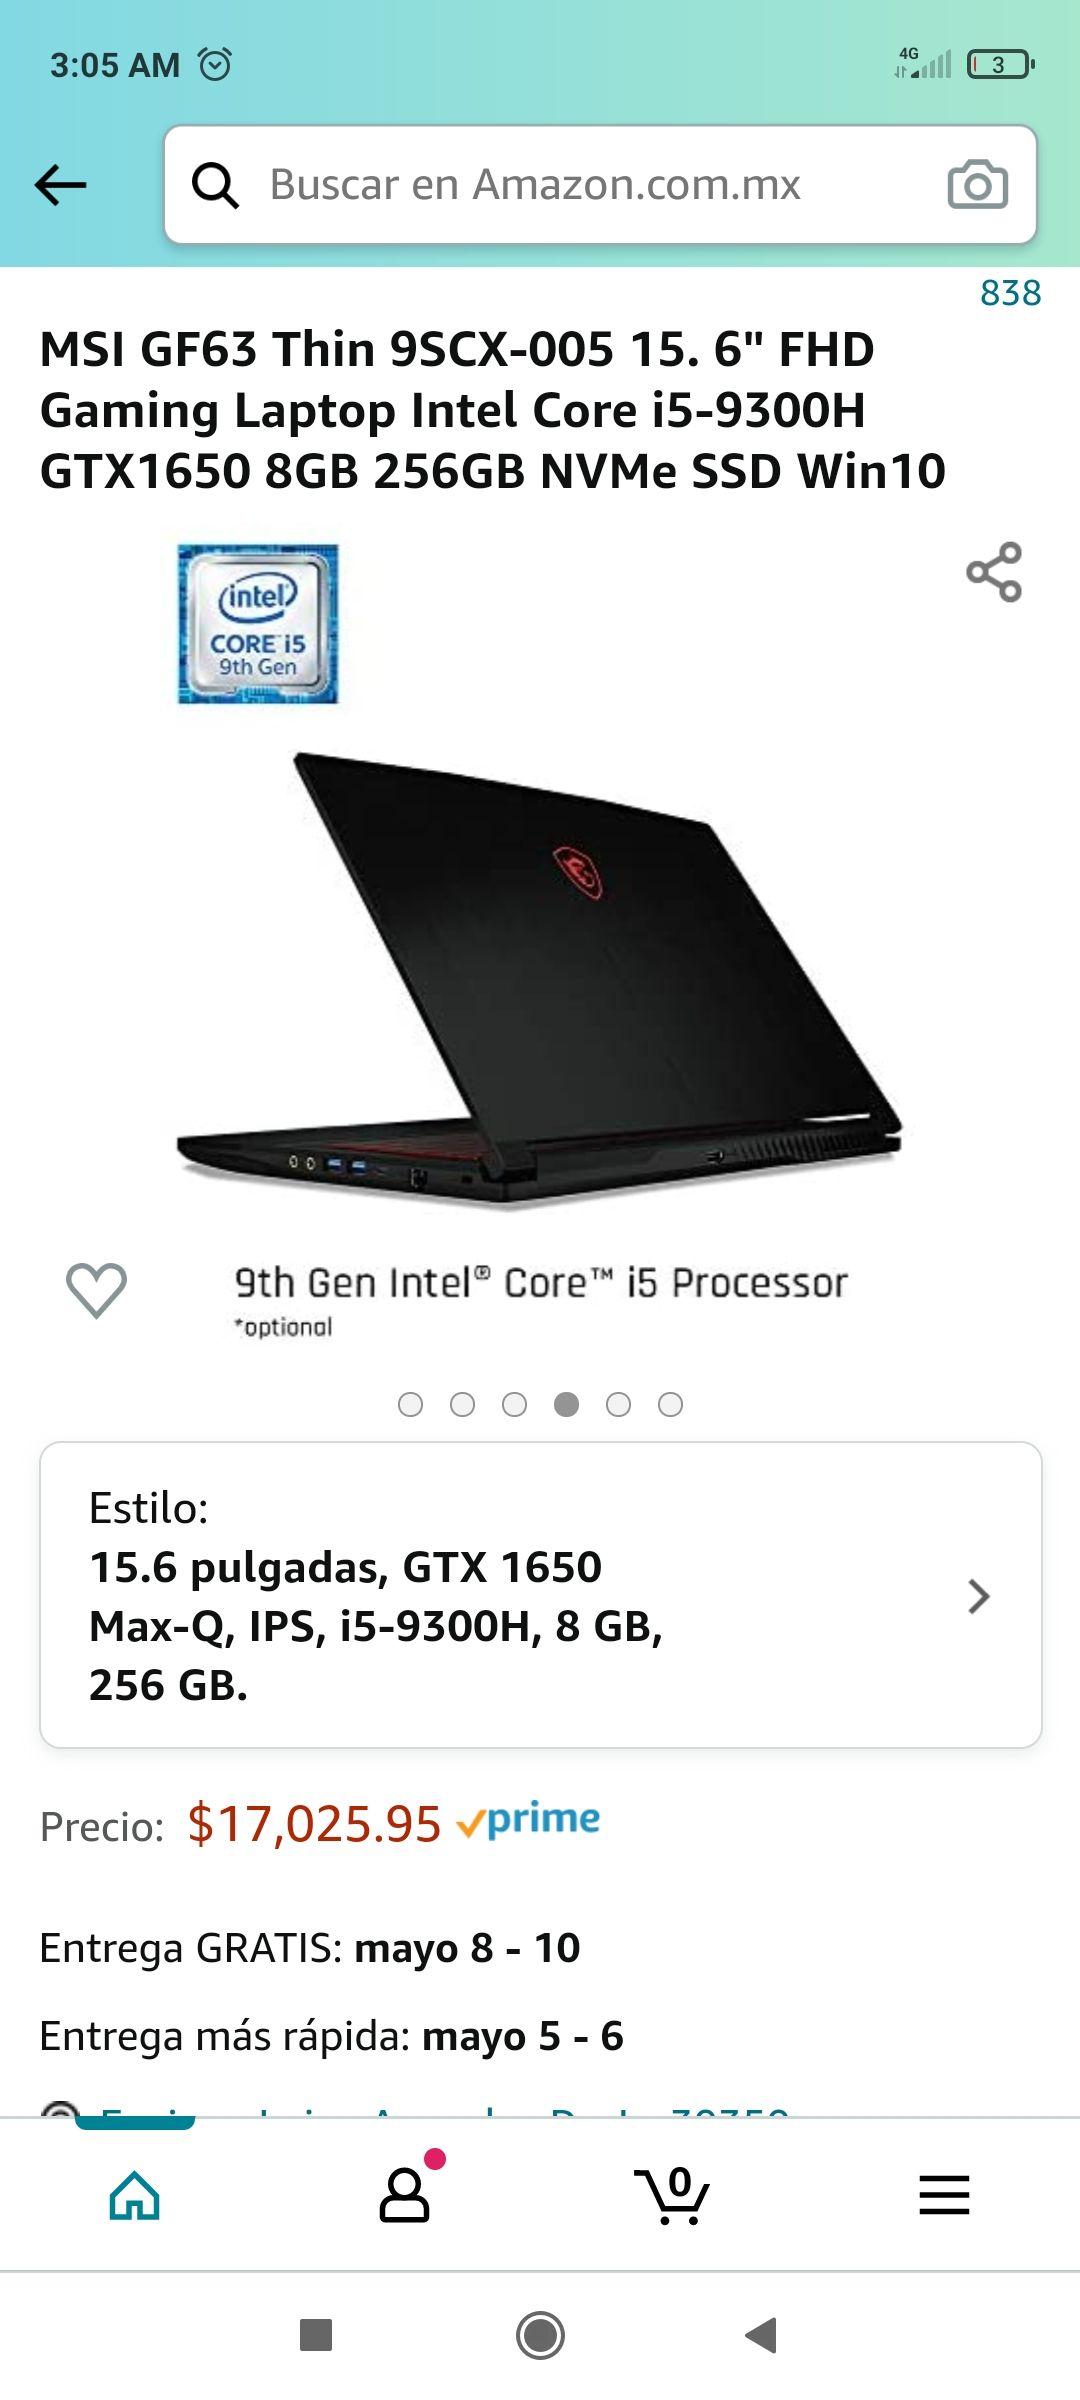 "Amazon MSI GF63 Thin 9SCX-005 15. 6"" FHD Gaming Laptop Intel Core i5-9300H GTX1650 8GB 256GB NVMe SSD Win10"